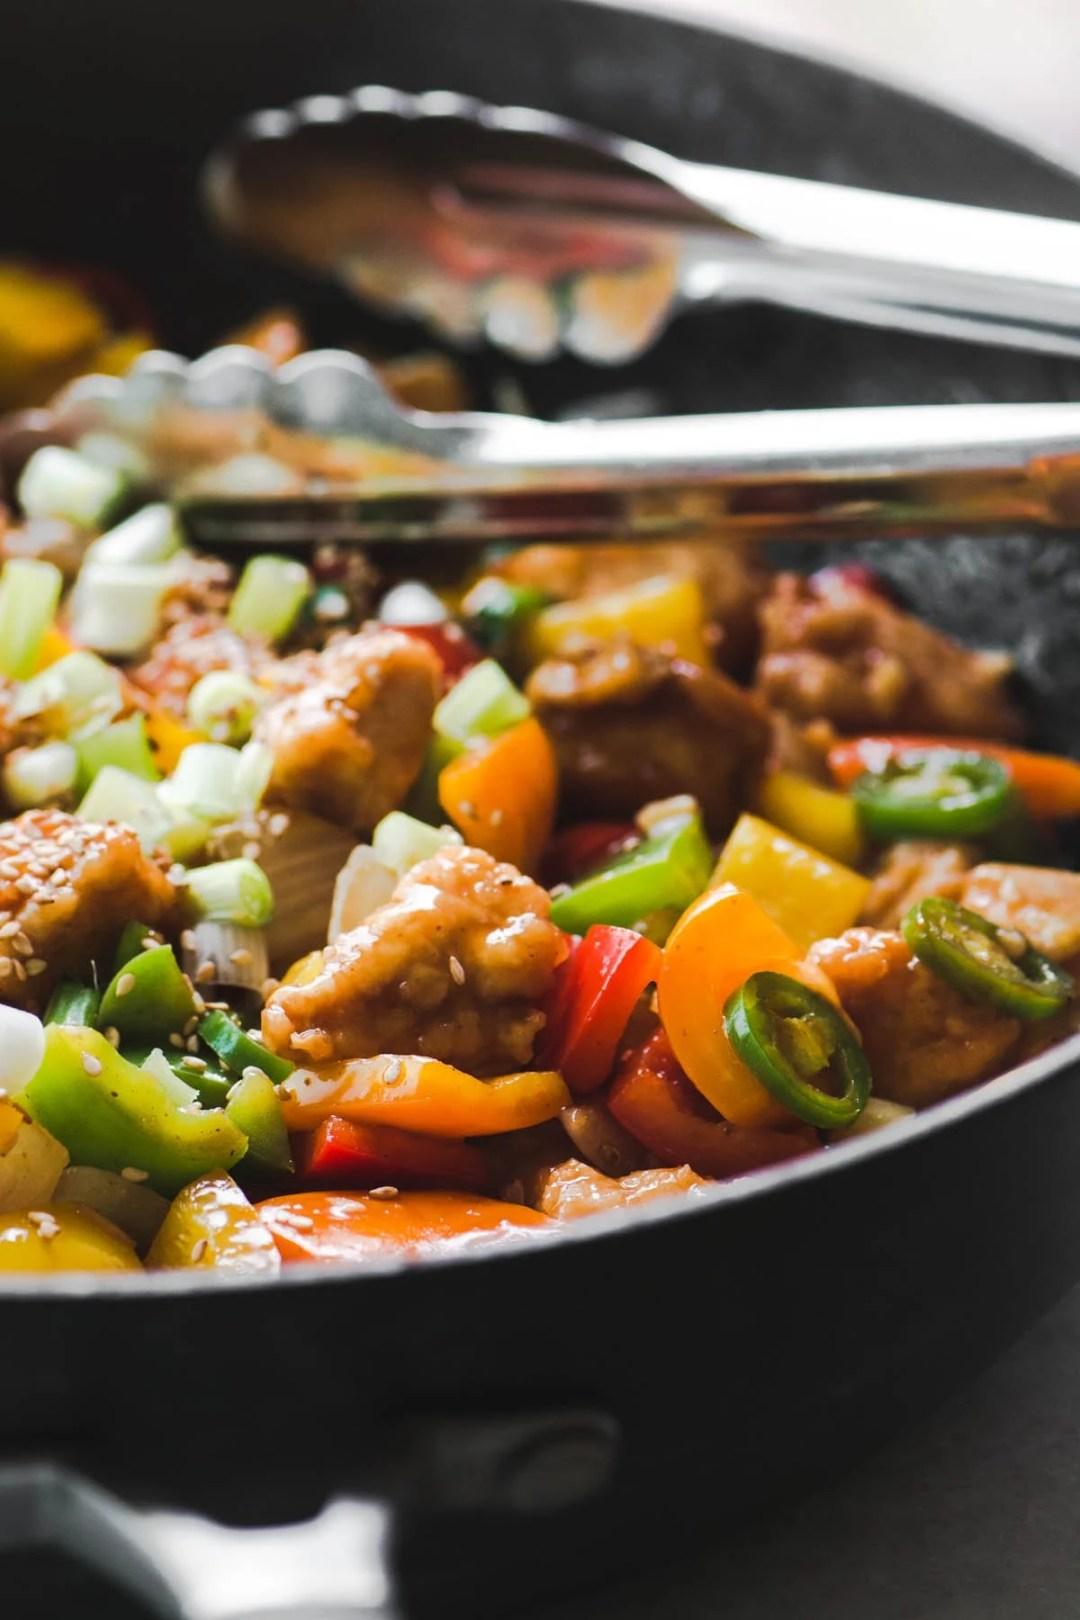 Making Firecracker Chicken at home, in a wok.